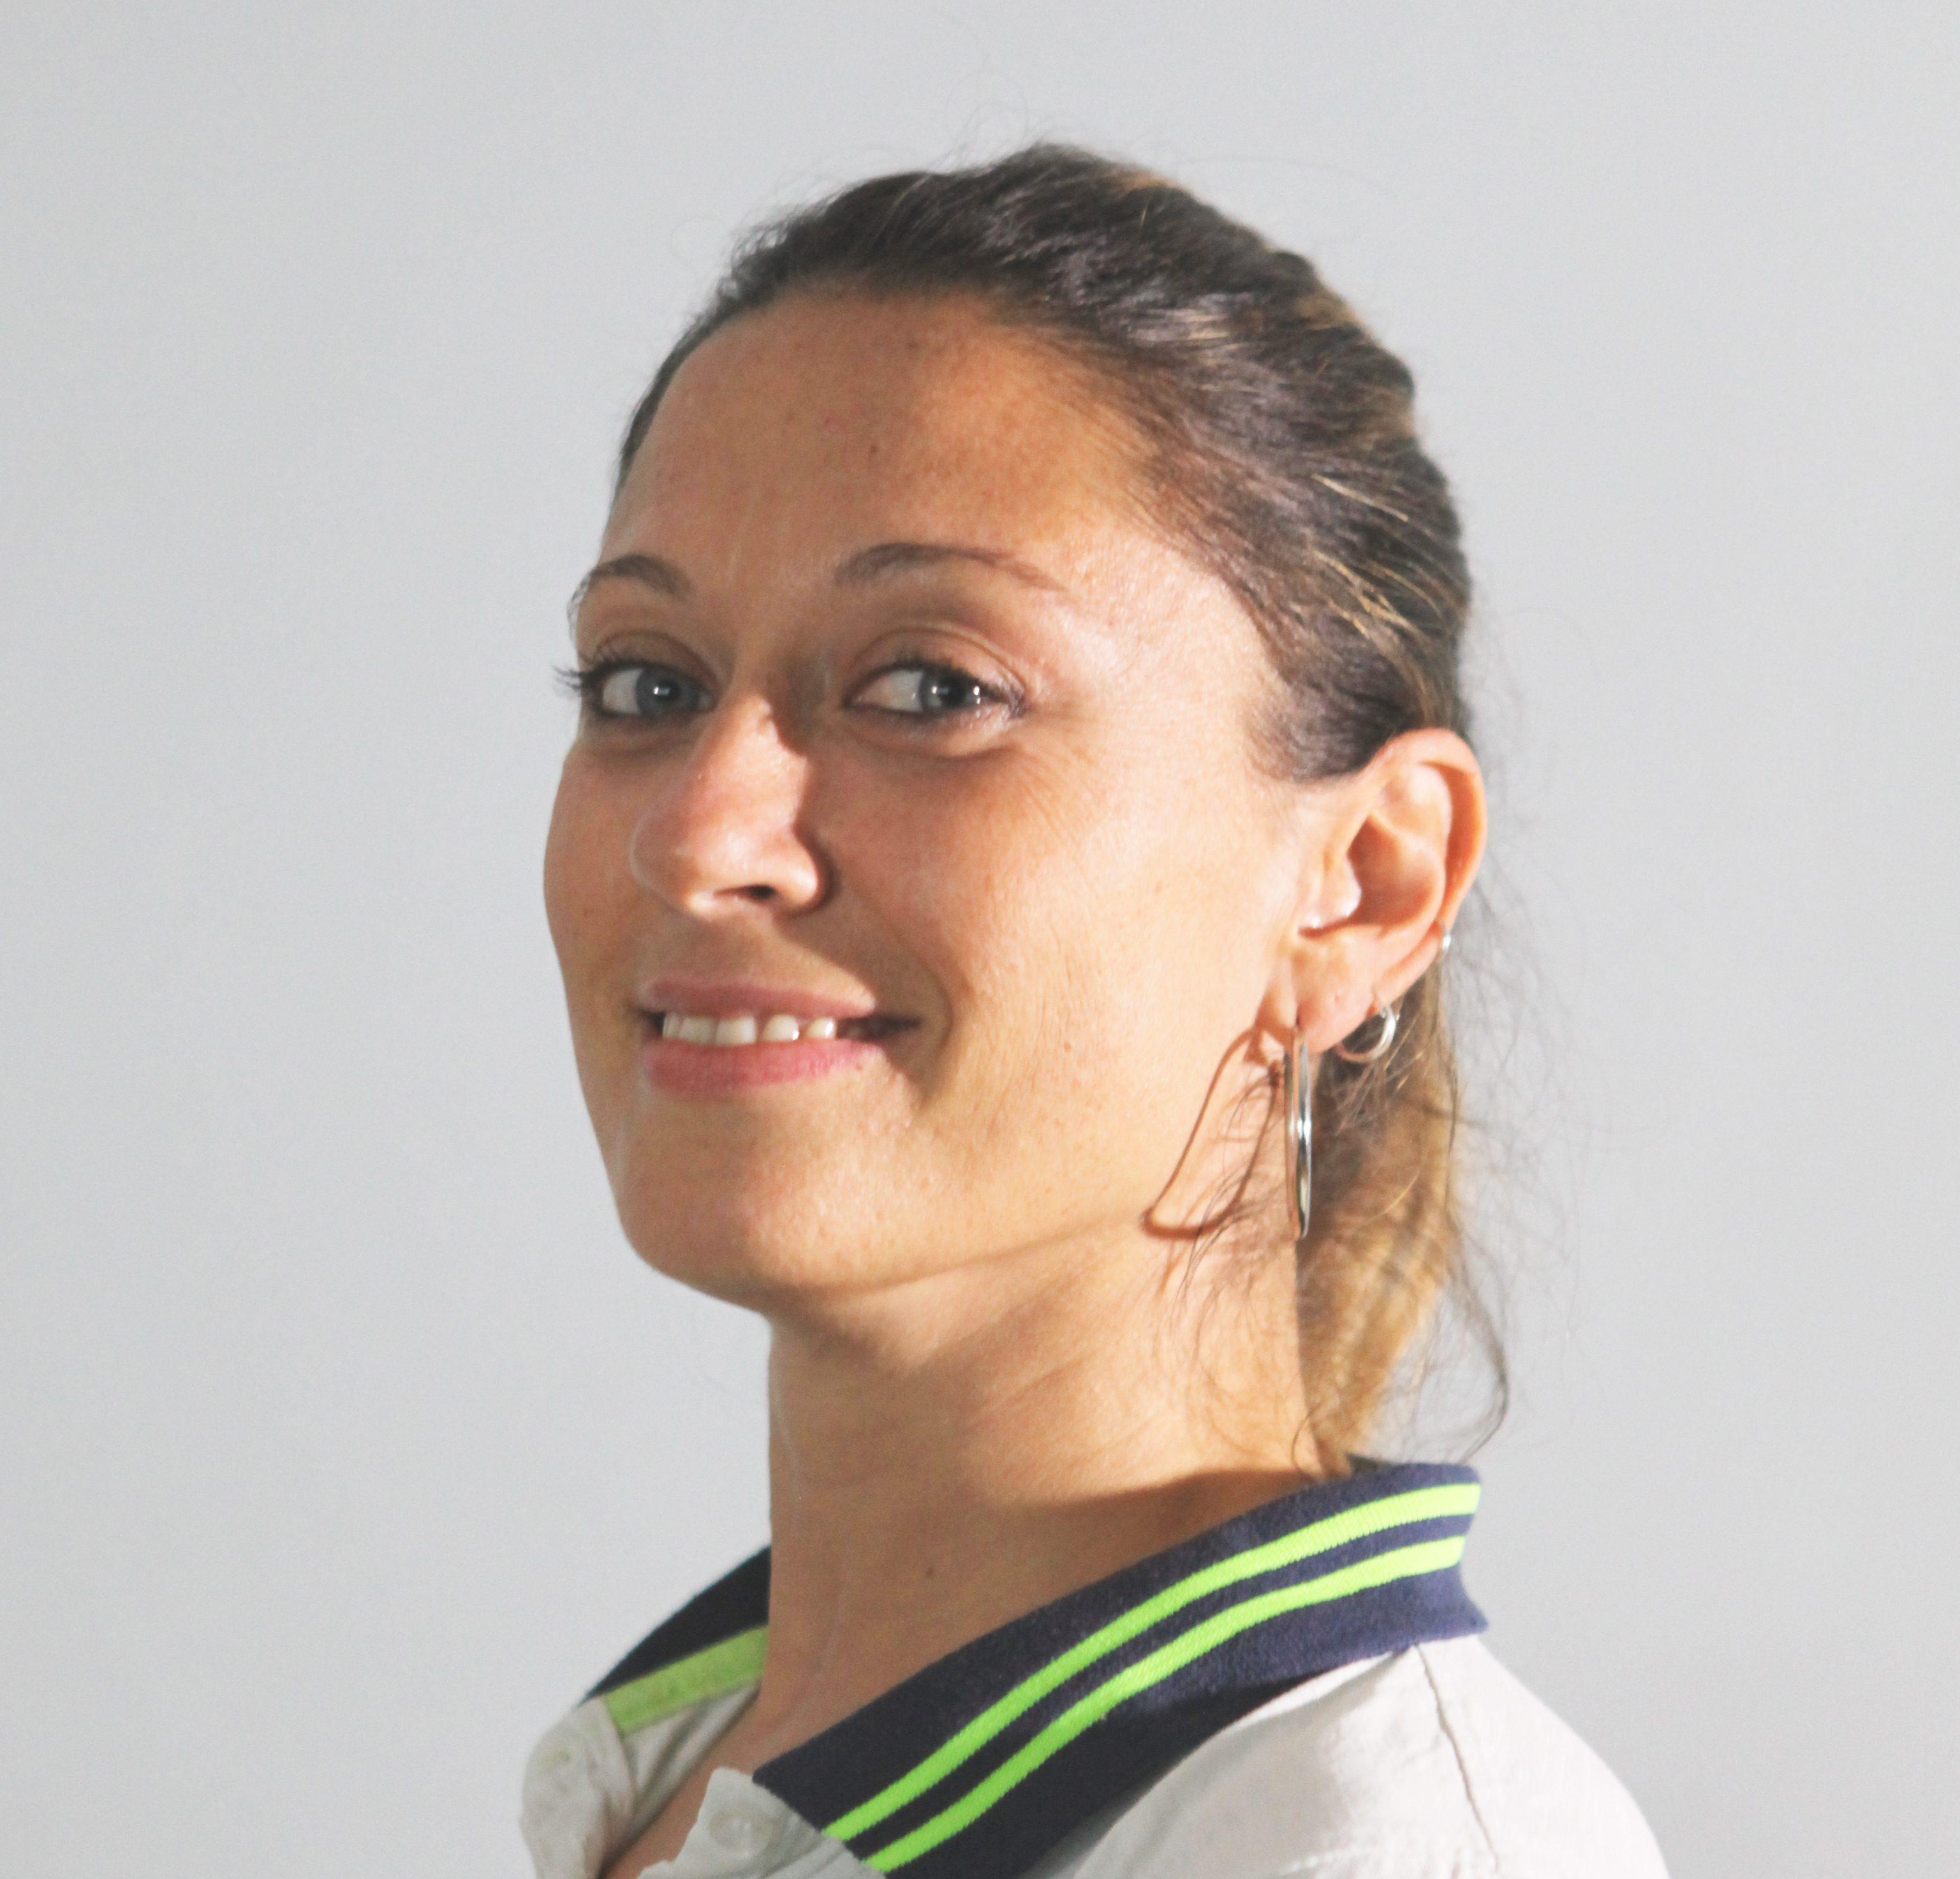 Sara Crotti Pianeta Postura